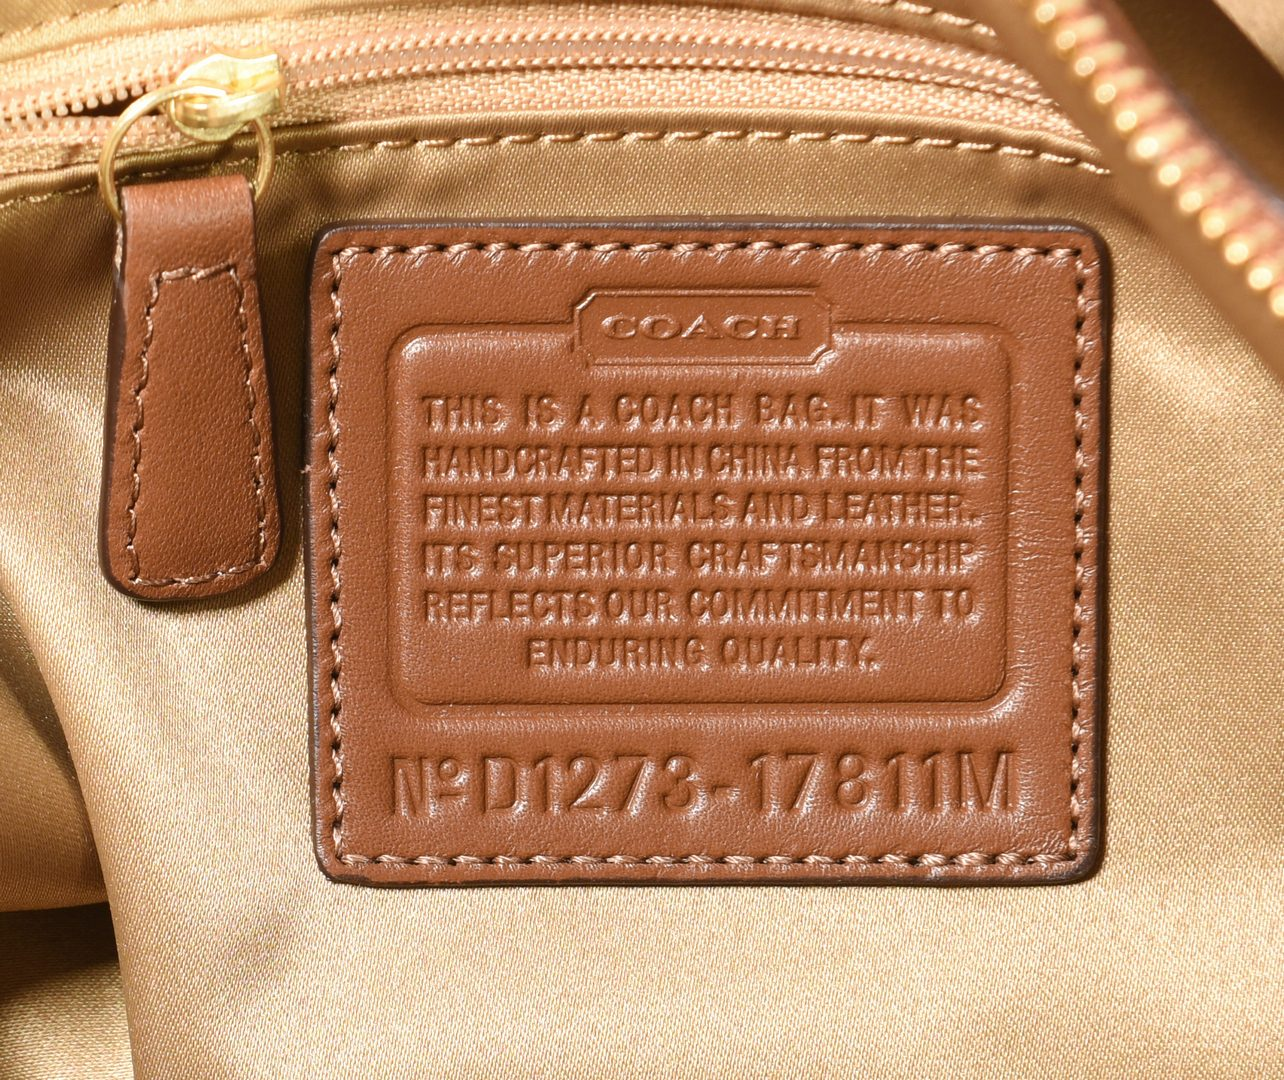 Lot 165: 2 Coach Handbags, NWT